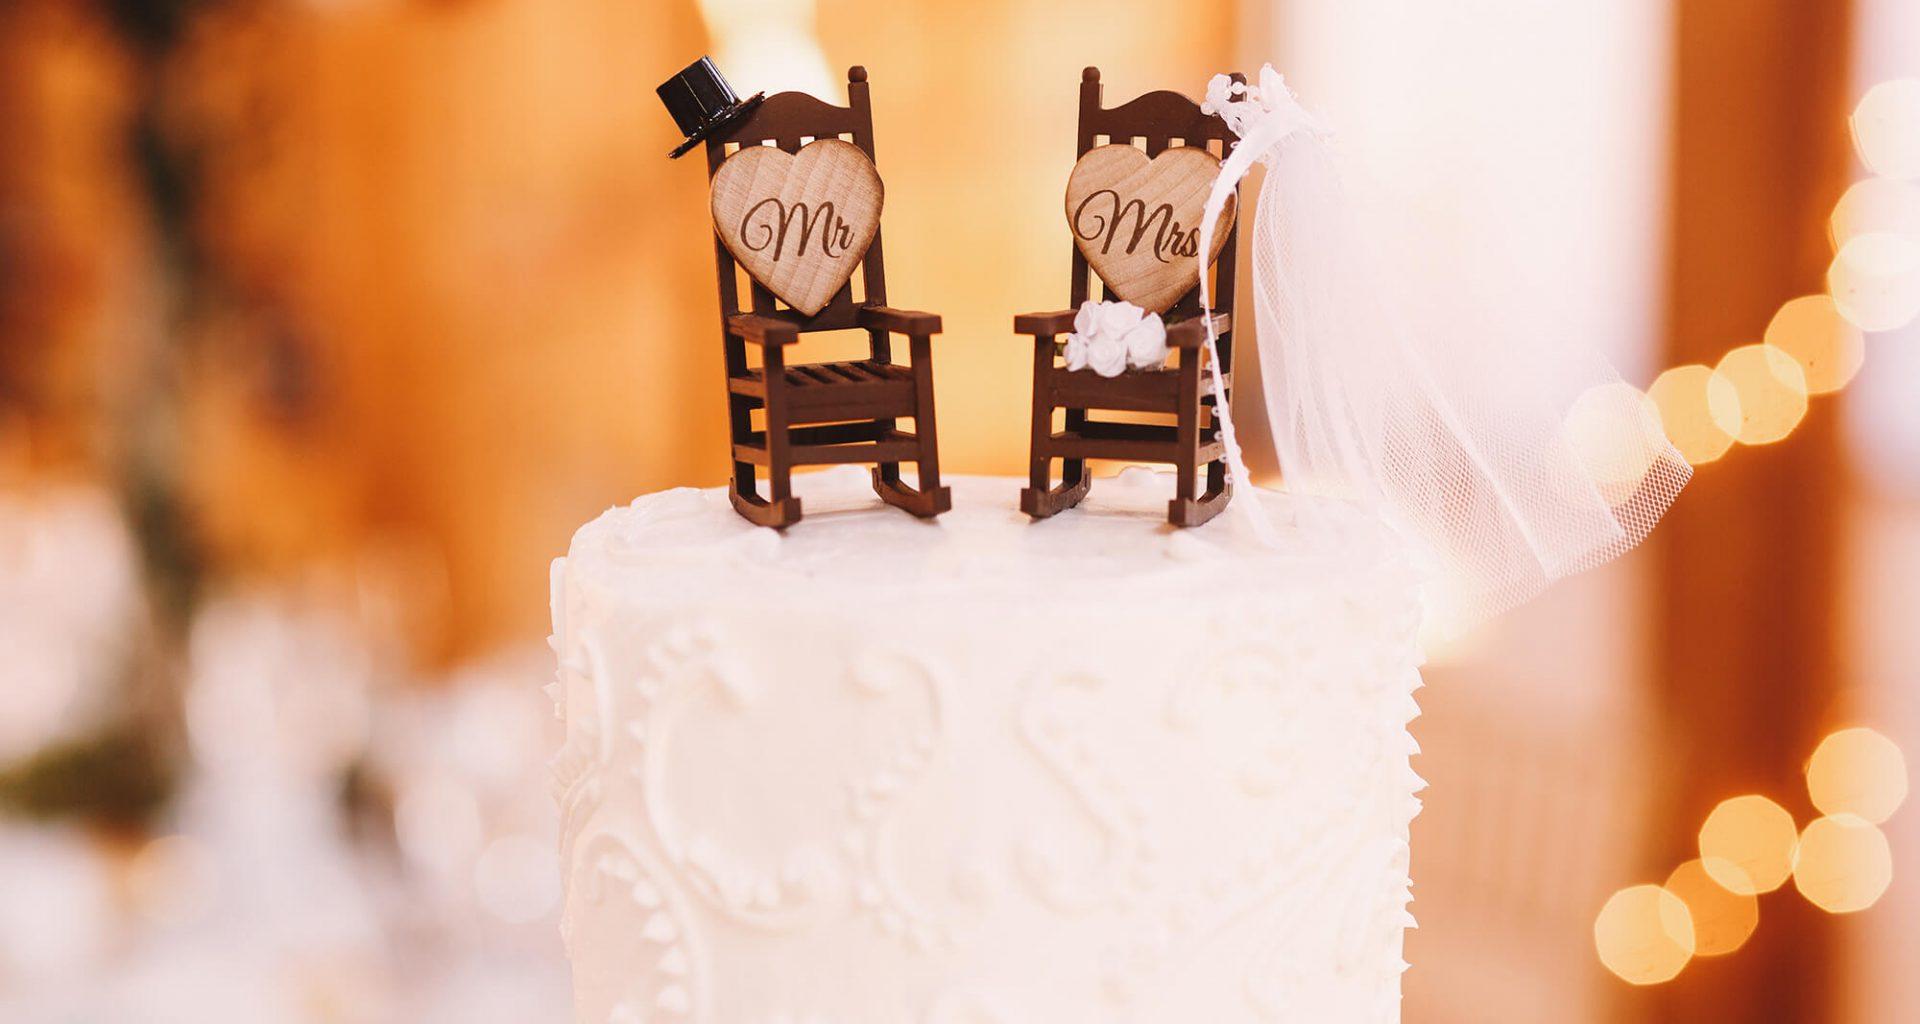 thème de mariage